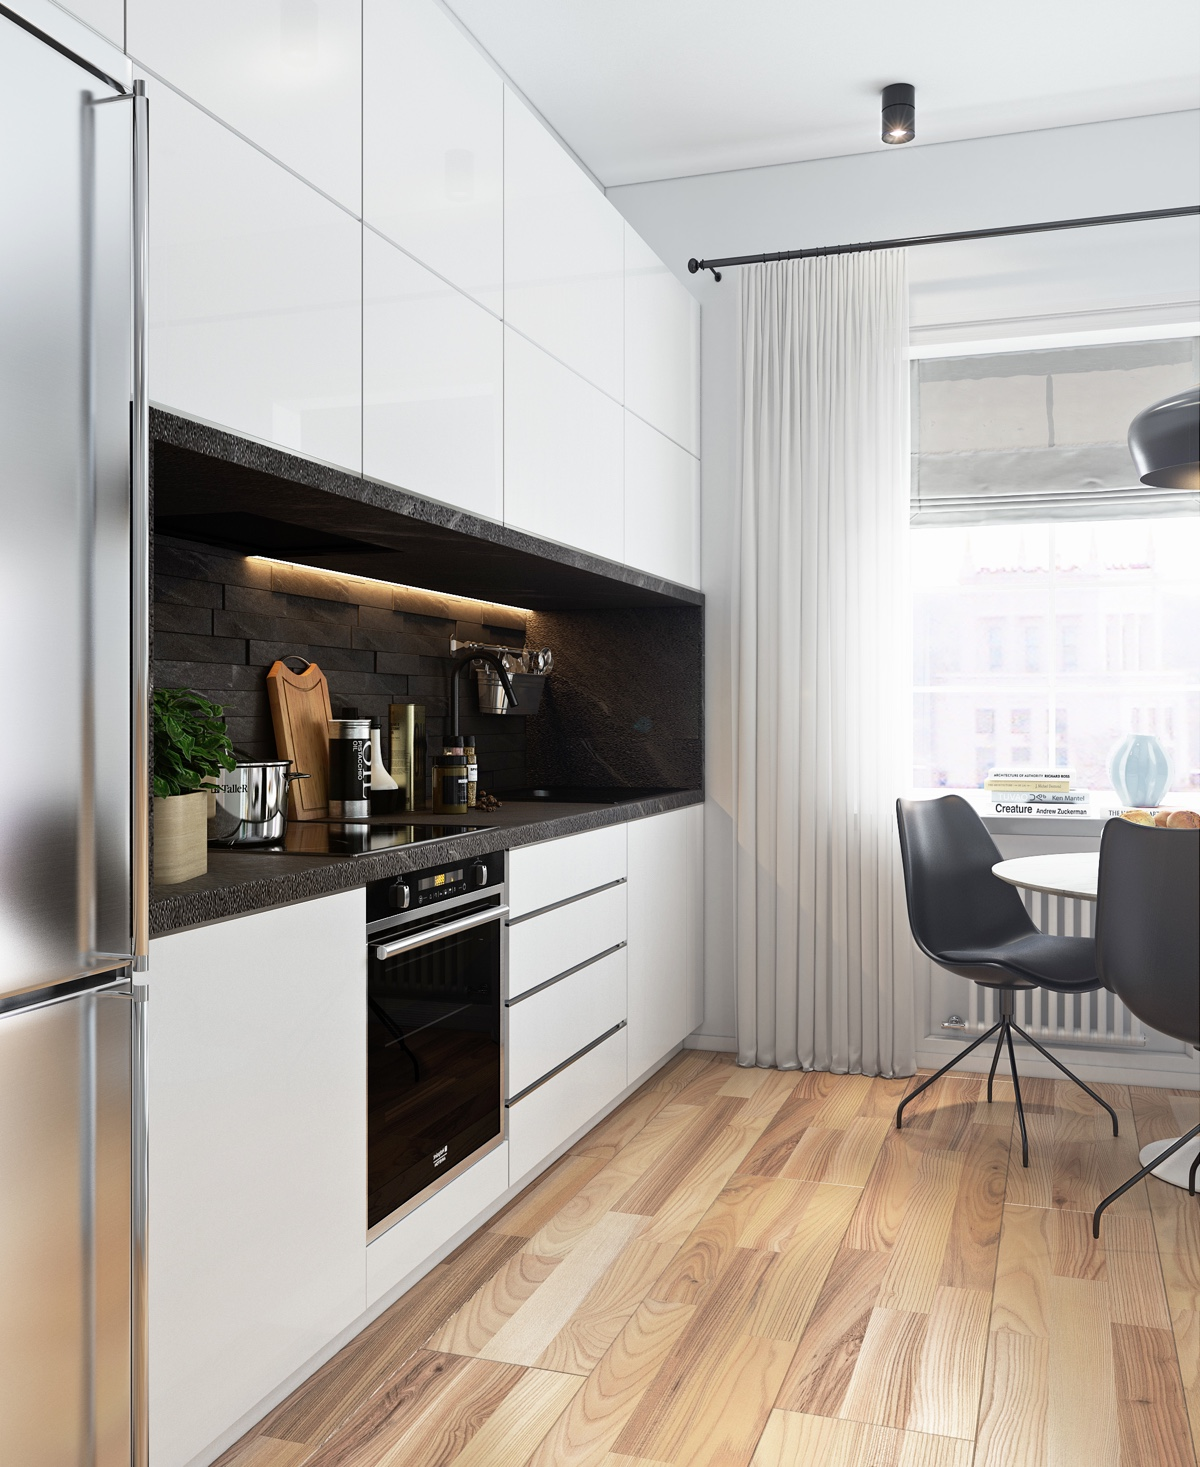 Compact Kitchen Units For Studio: 5 Beautiful Studio Apartments